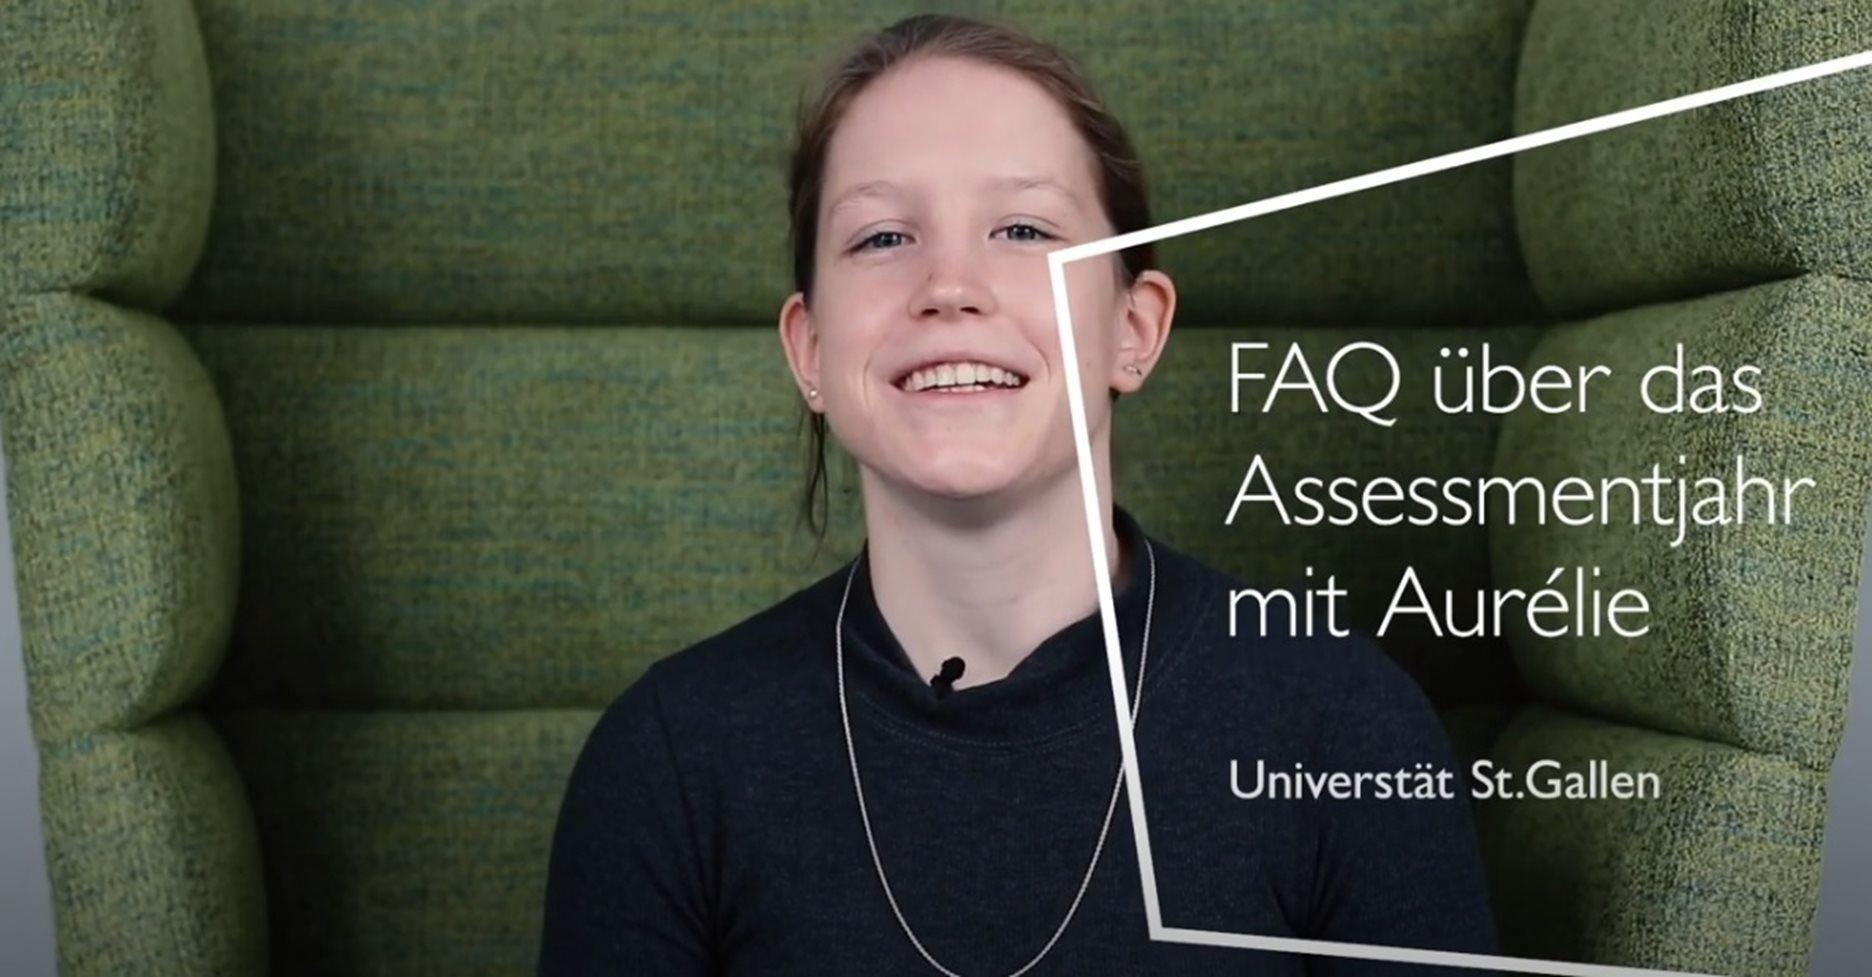 10 FAQ Assessmentjahr